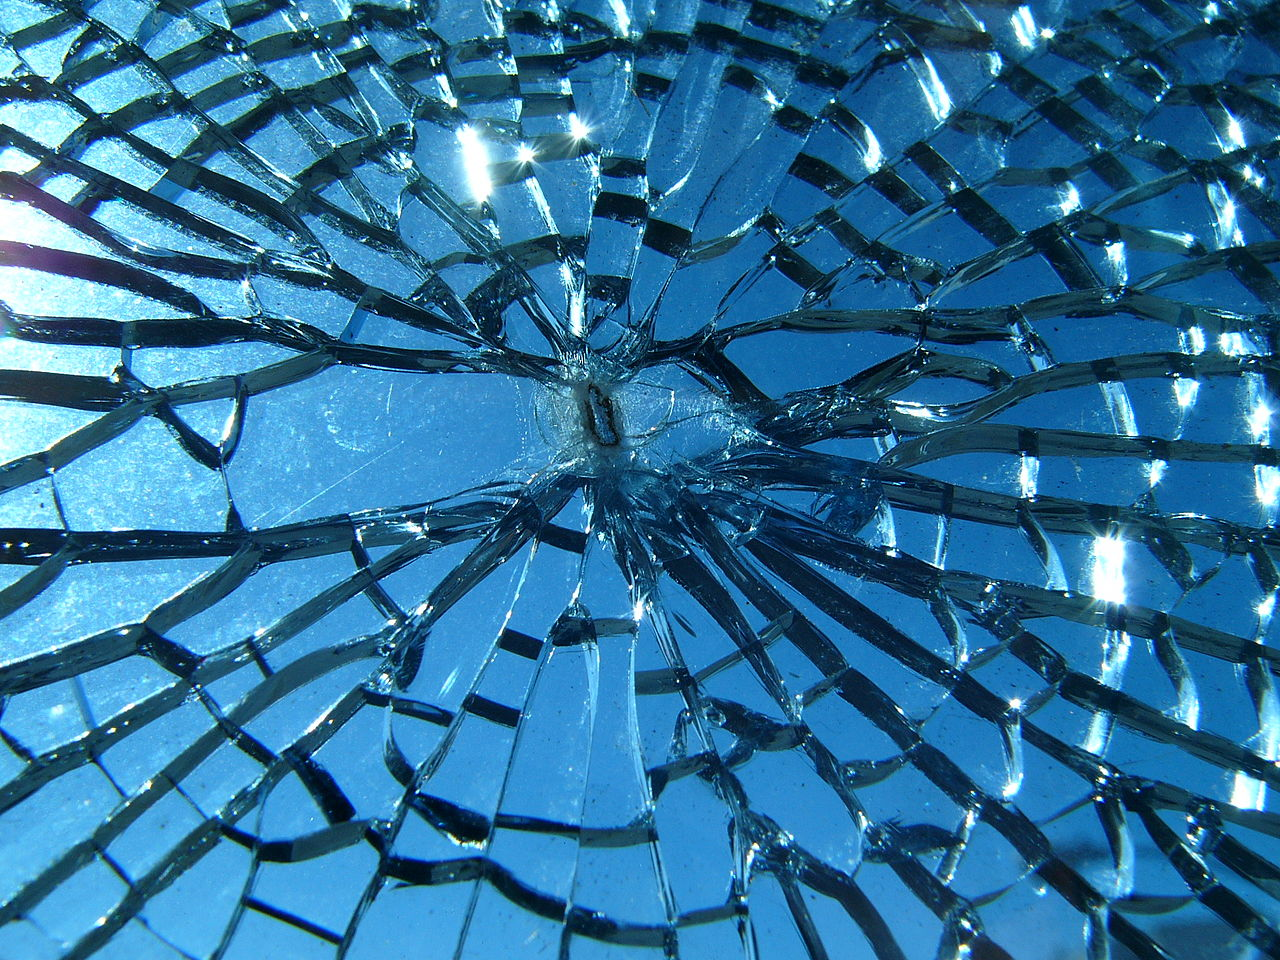 File:Broken glass.jpg ...